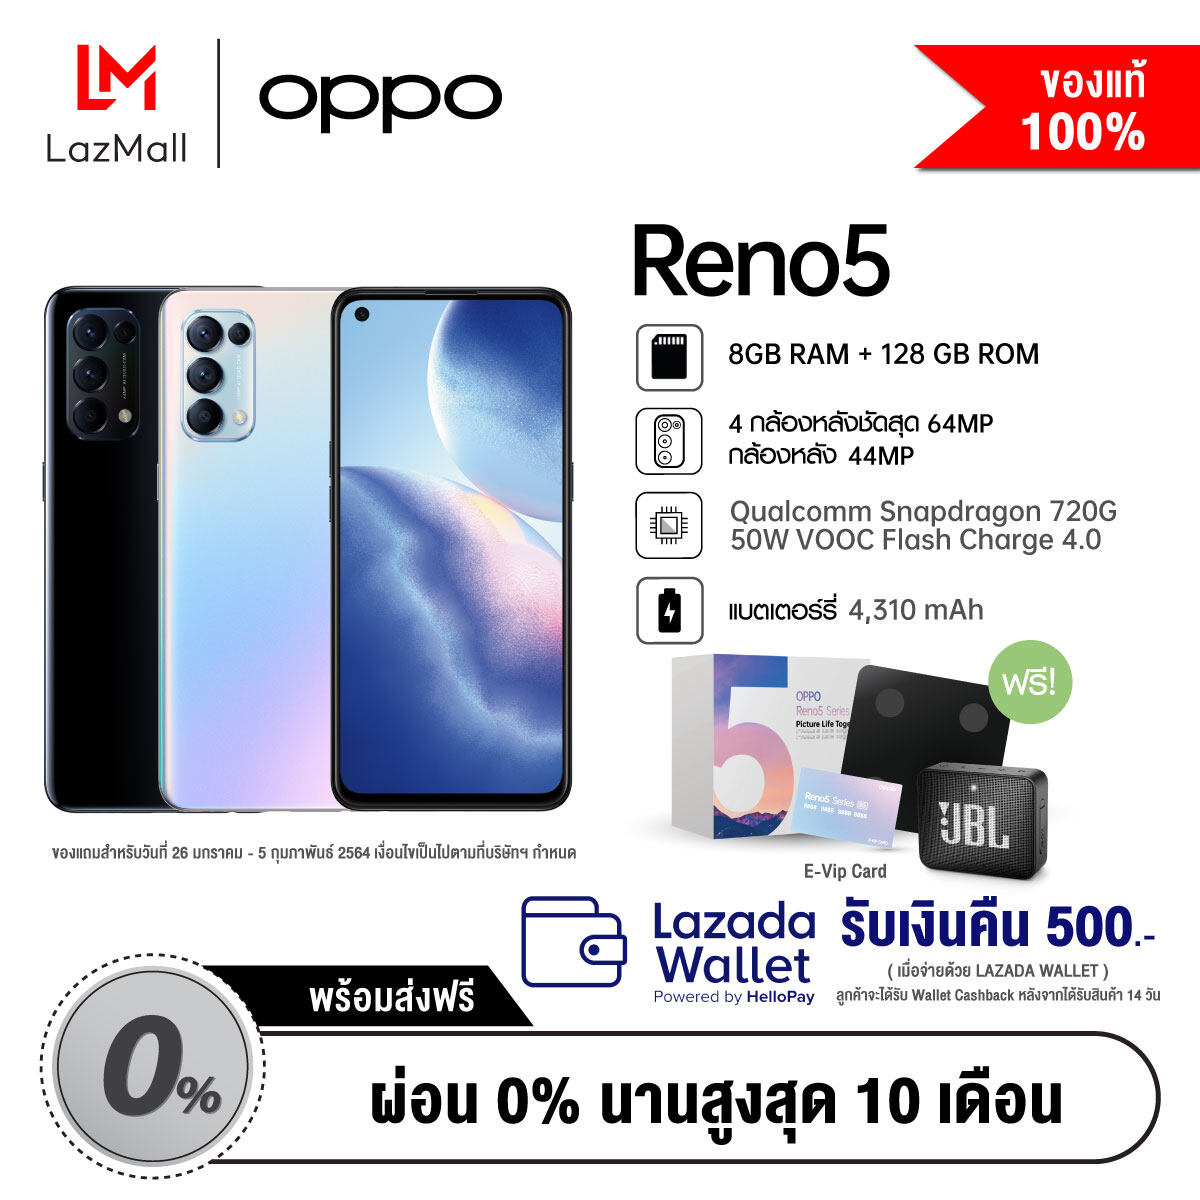 [Pre Order] Oppo Reno 5 (8GB + 128GB) รับฟรี! E-VIP Card, เครื่องชั่งน้ำหนักจาก Oppo, ลำโพง JBL Go 2 + Lazada Wallet Cashback 500 มูลค่ารวม 8,289.- (สินค้าจะจัดส่งหลัง 6 ก.พ.)